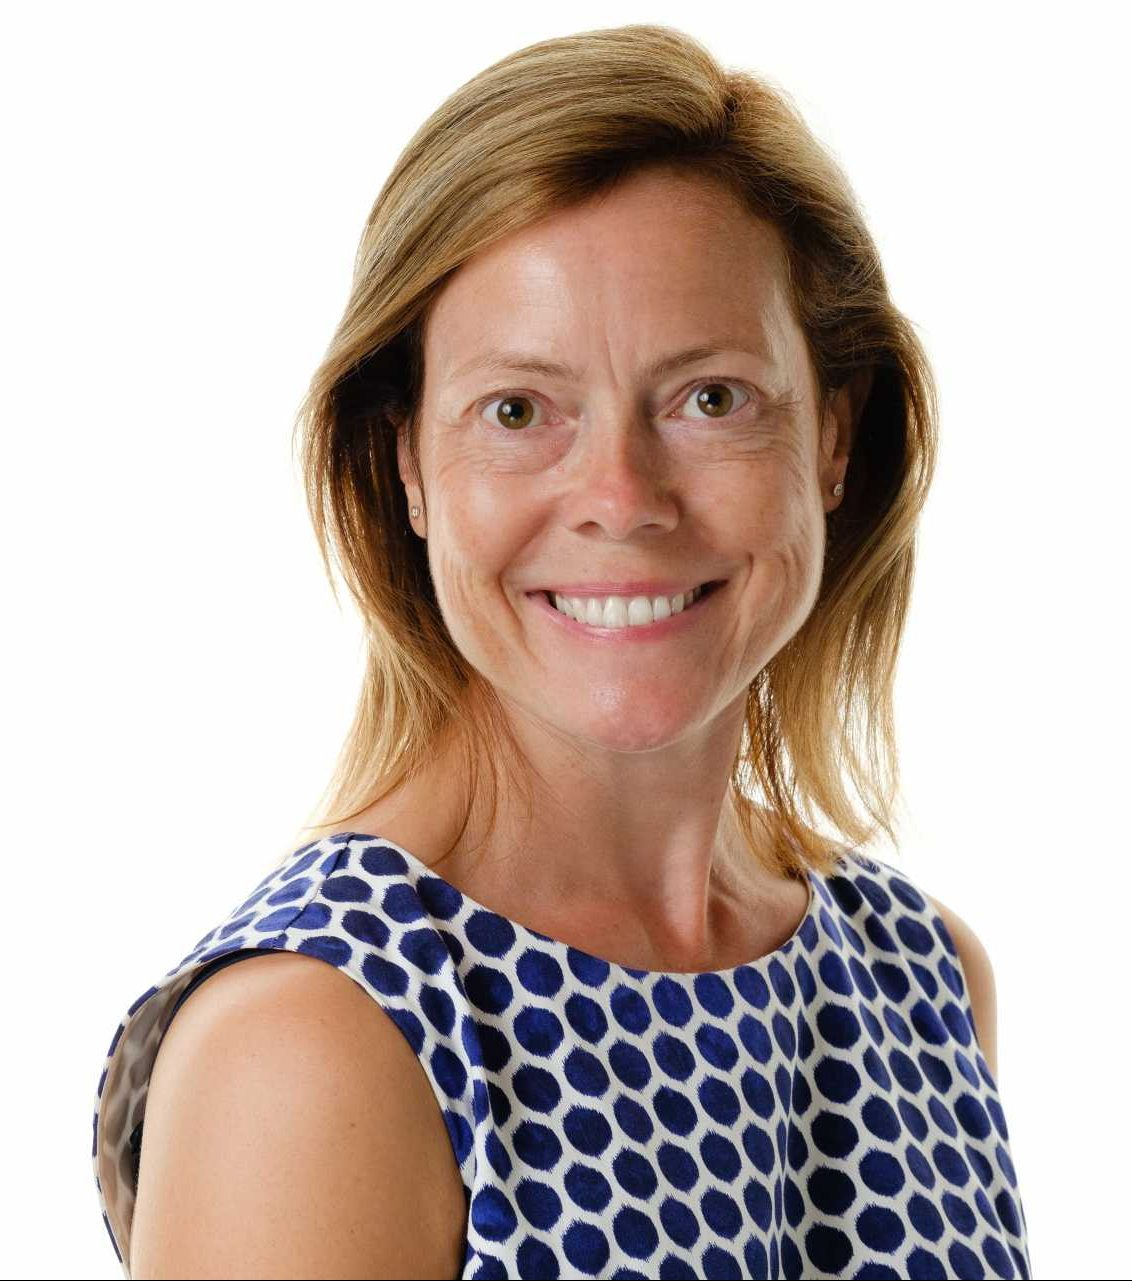 Ann Watson, CEO of Enginuity